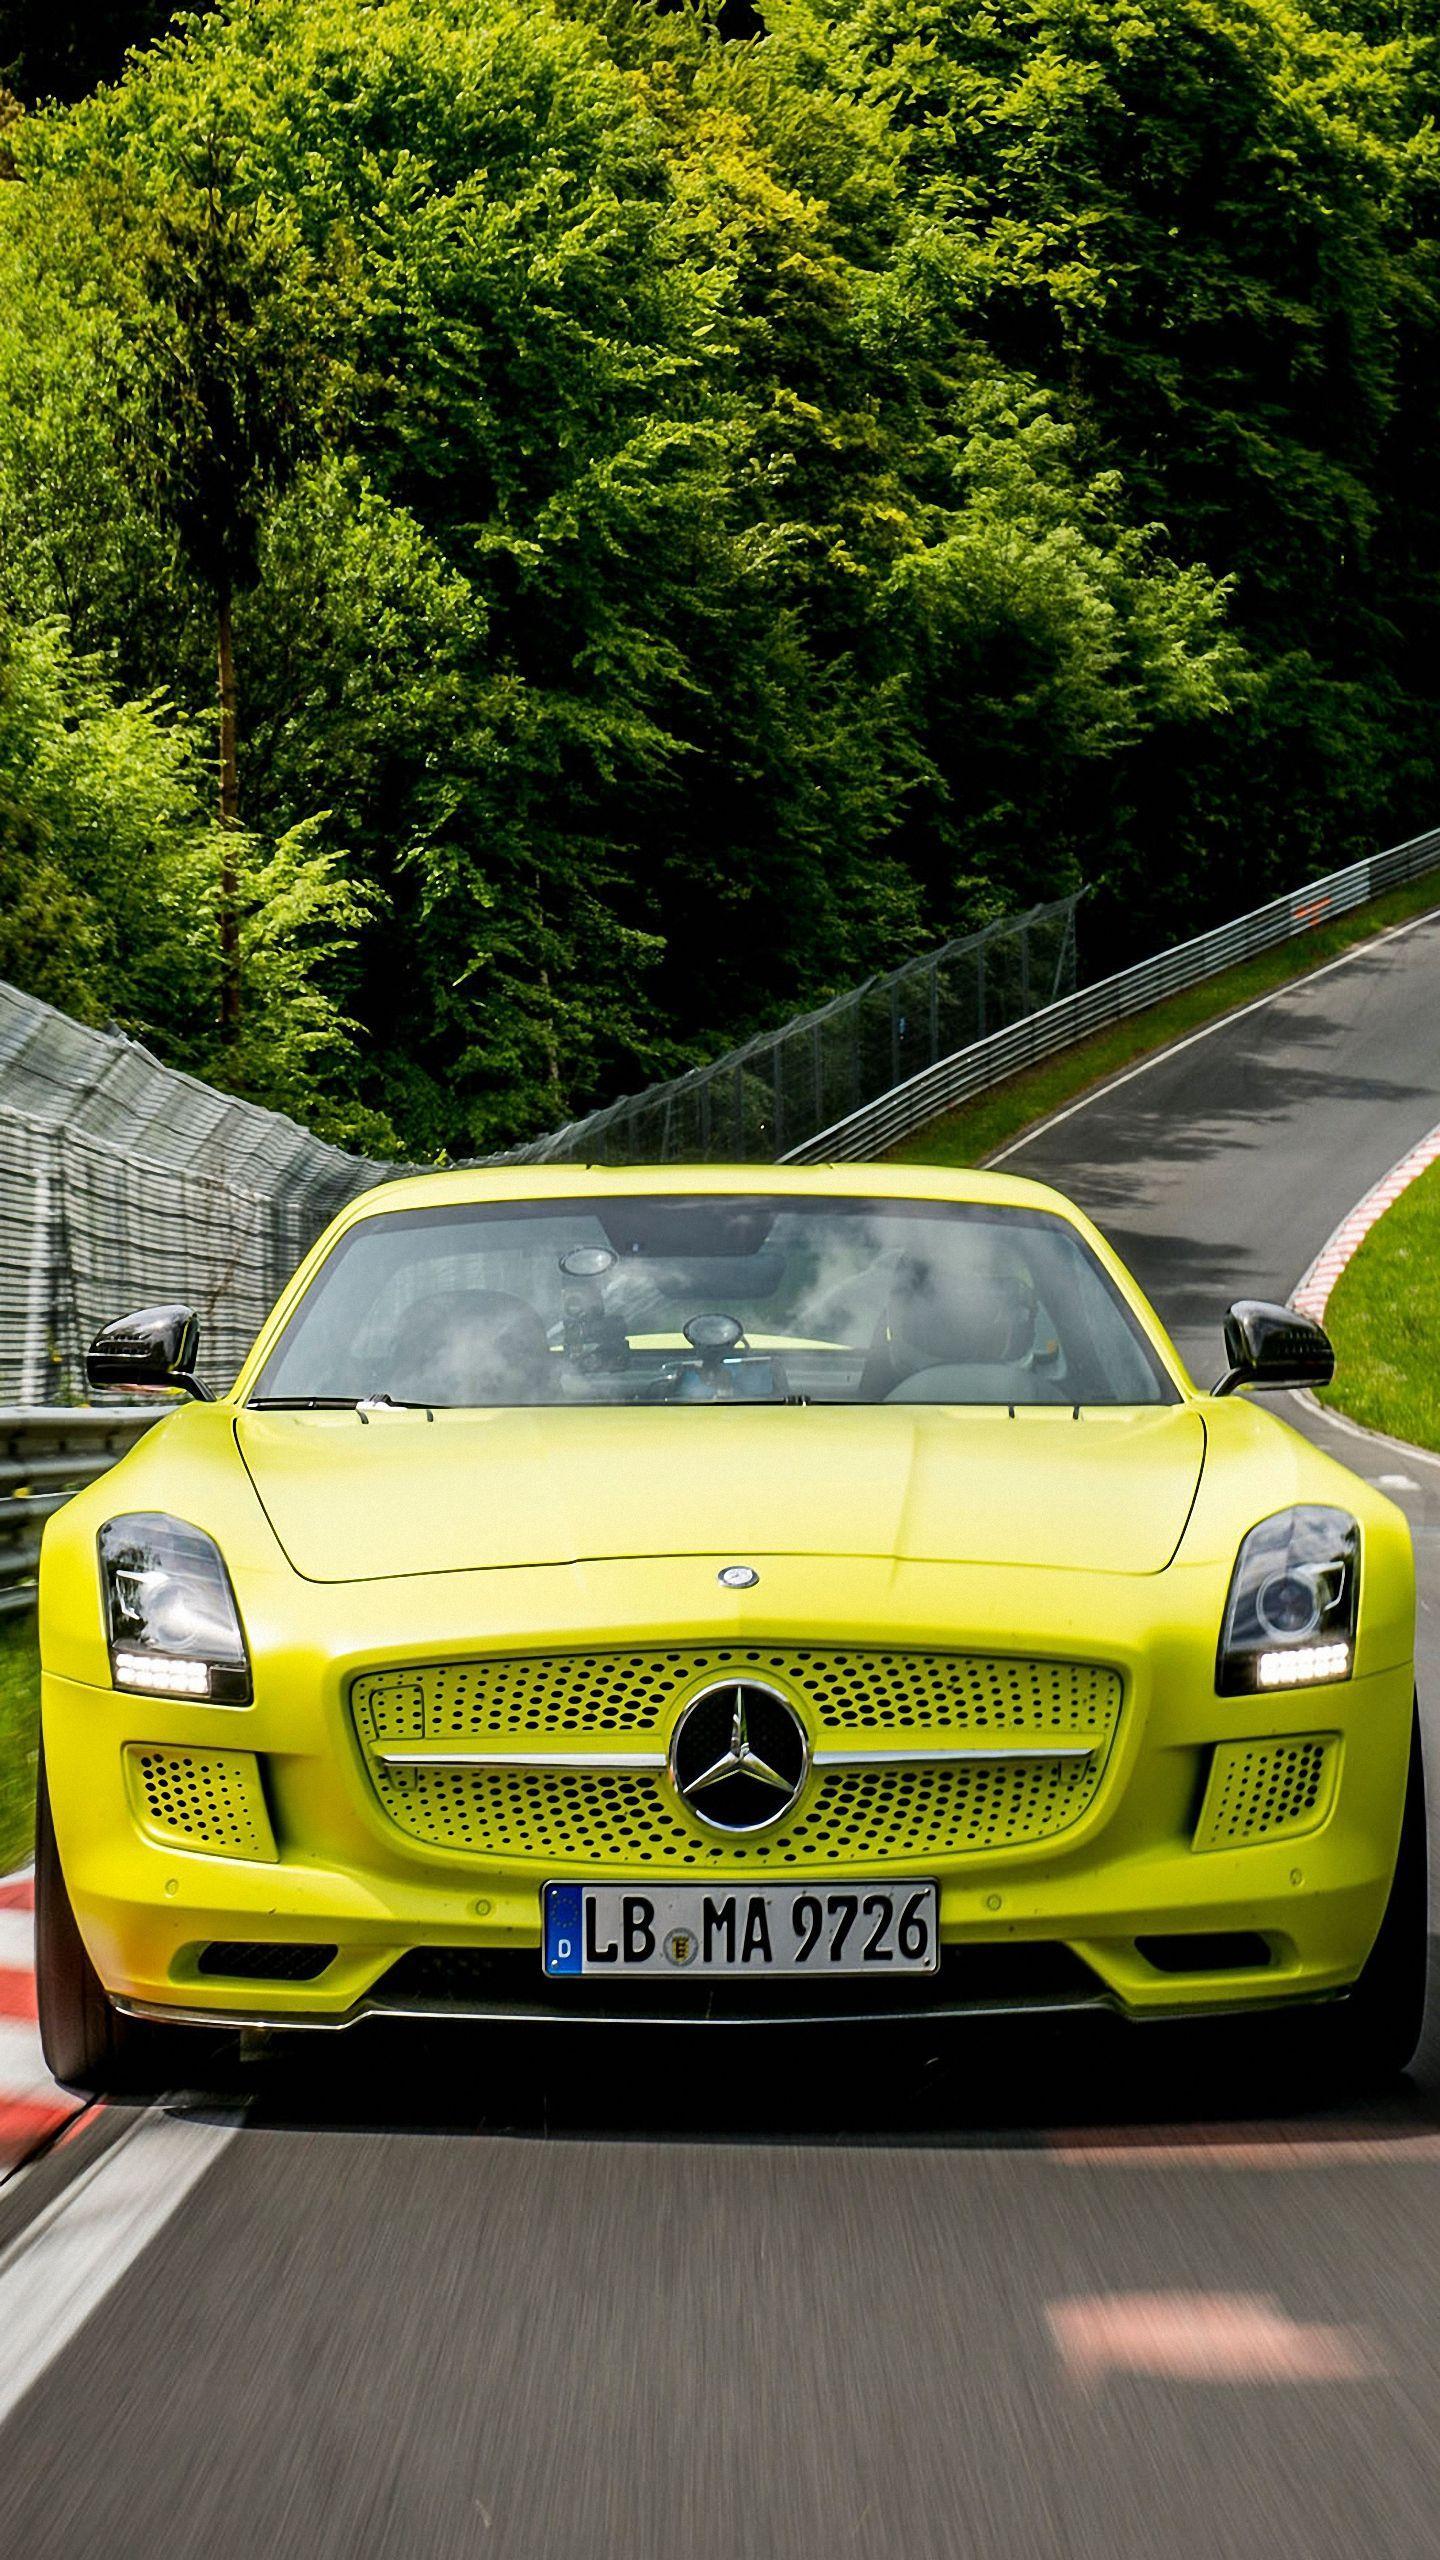 Mercedes Phone Wallpapers - Top Free Mercedes Phone ...